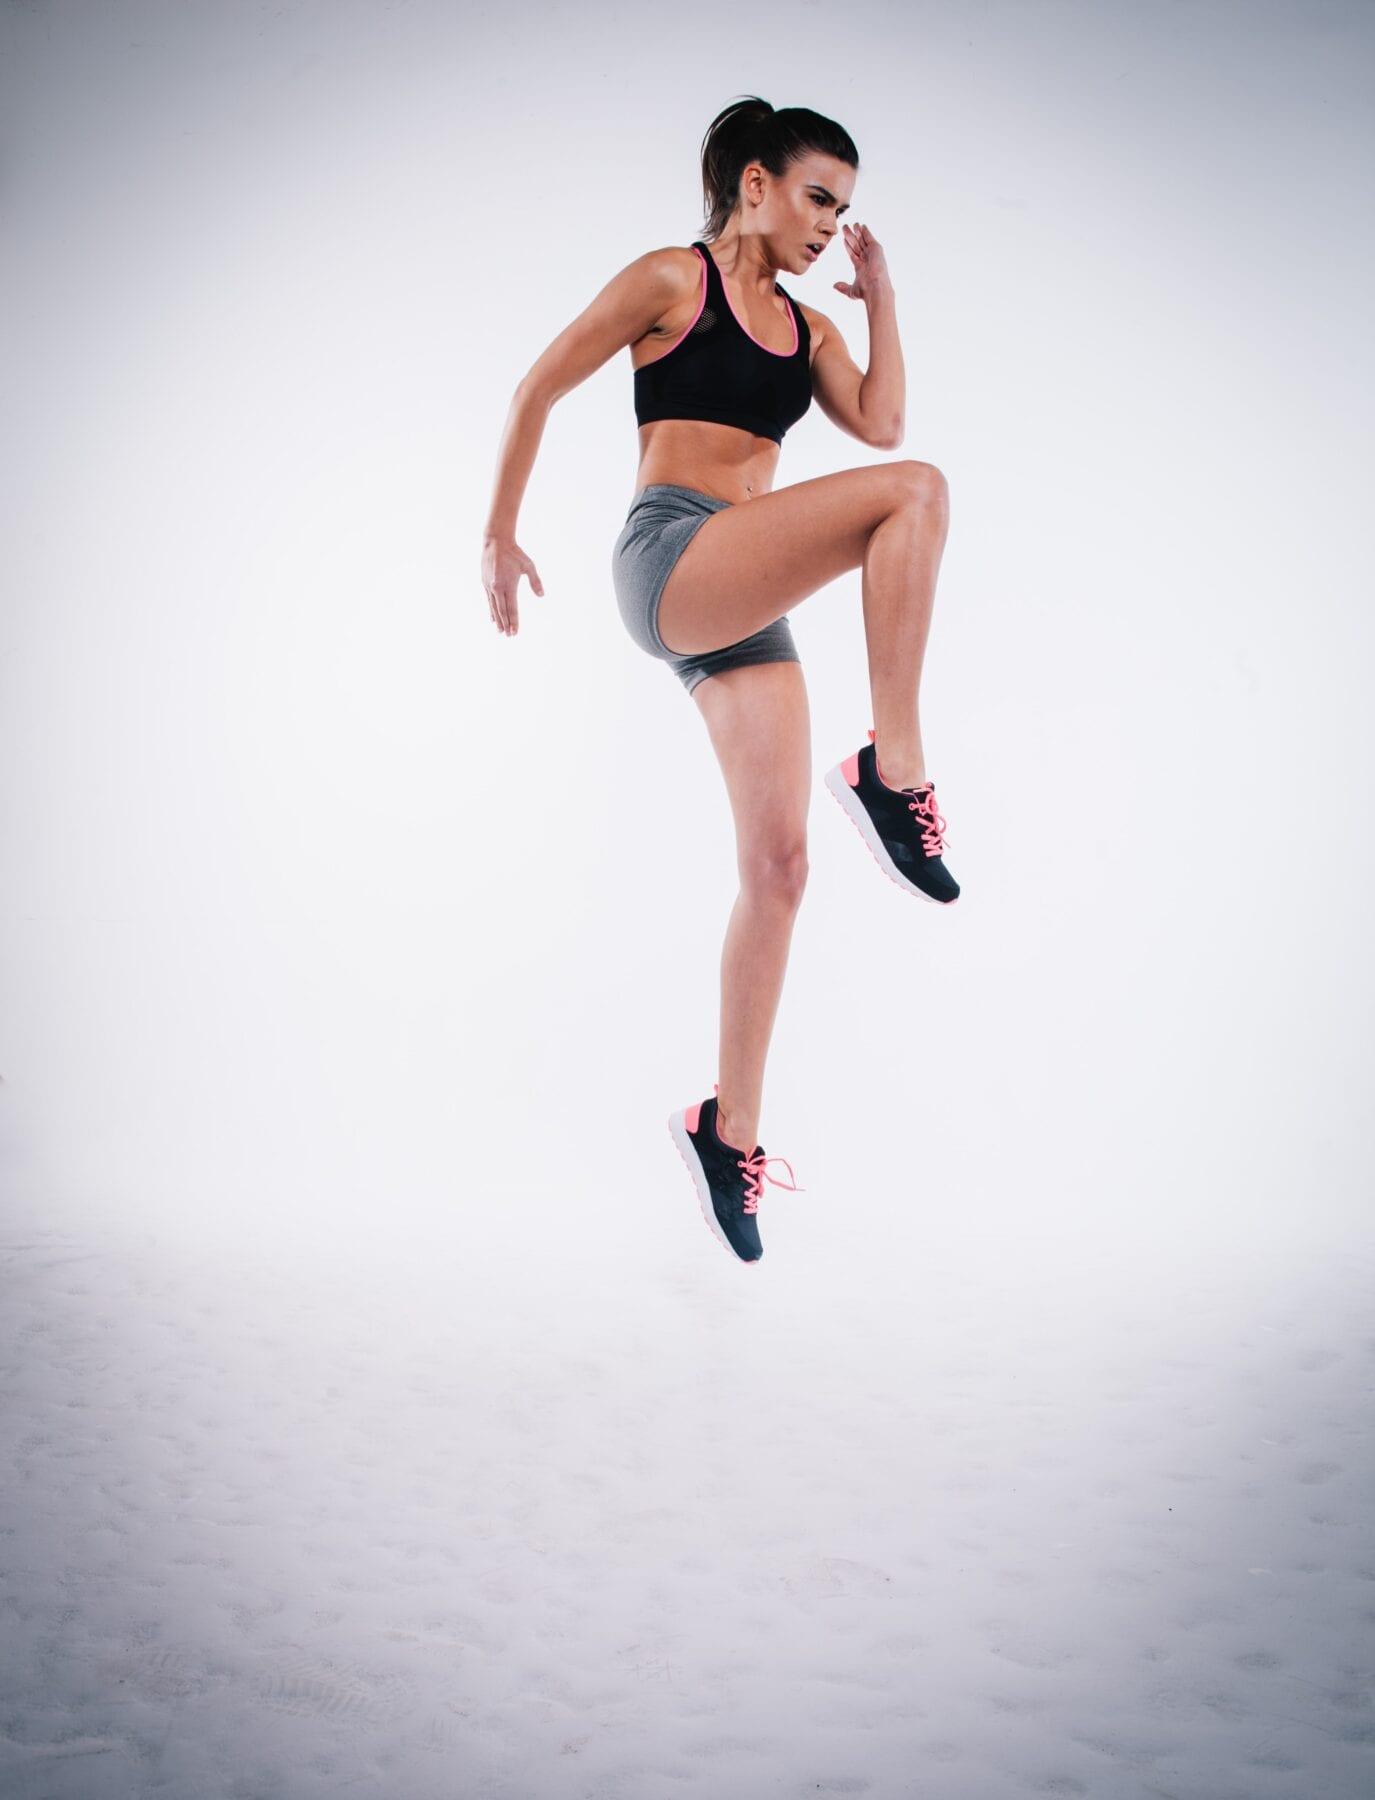 HIIT trainingen rennen